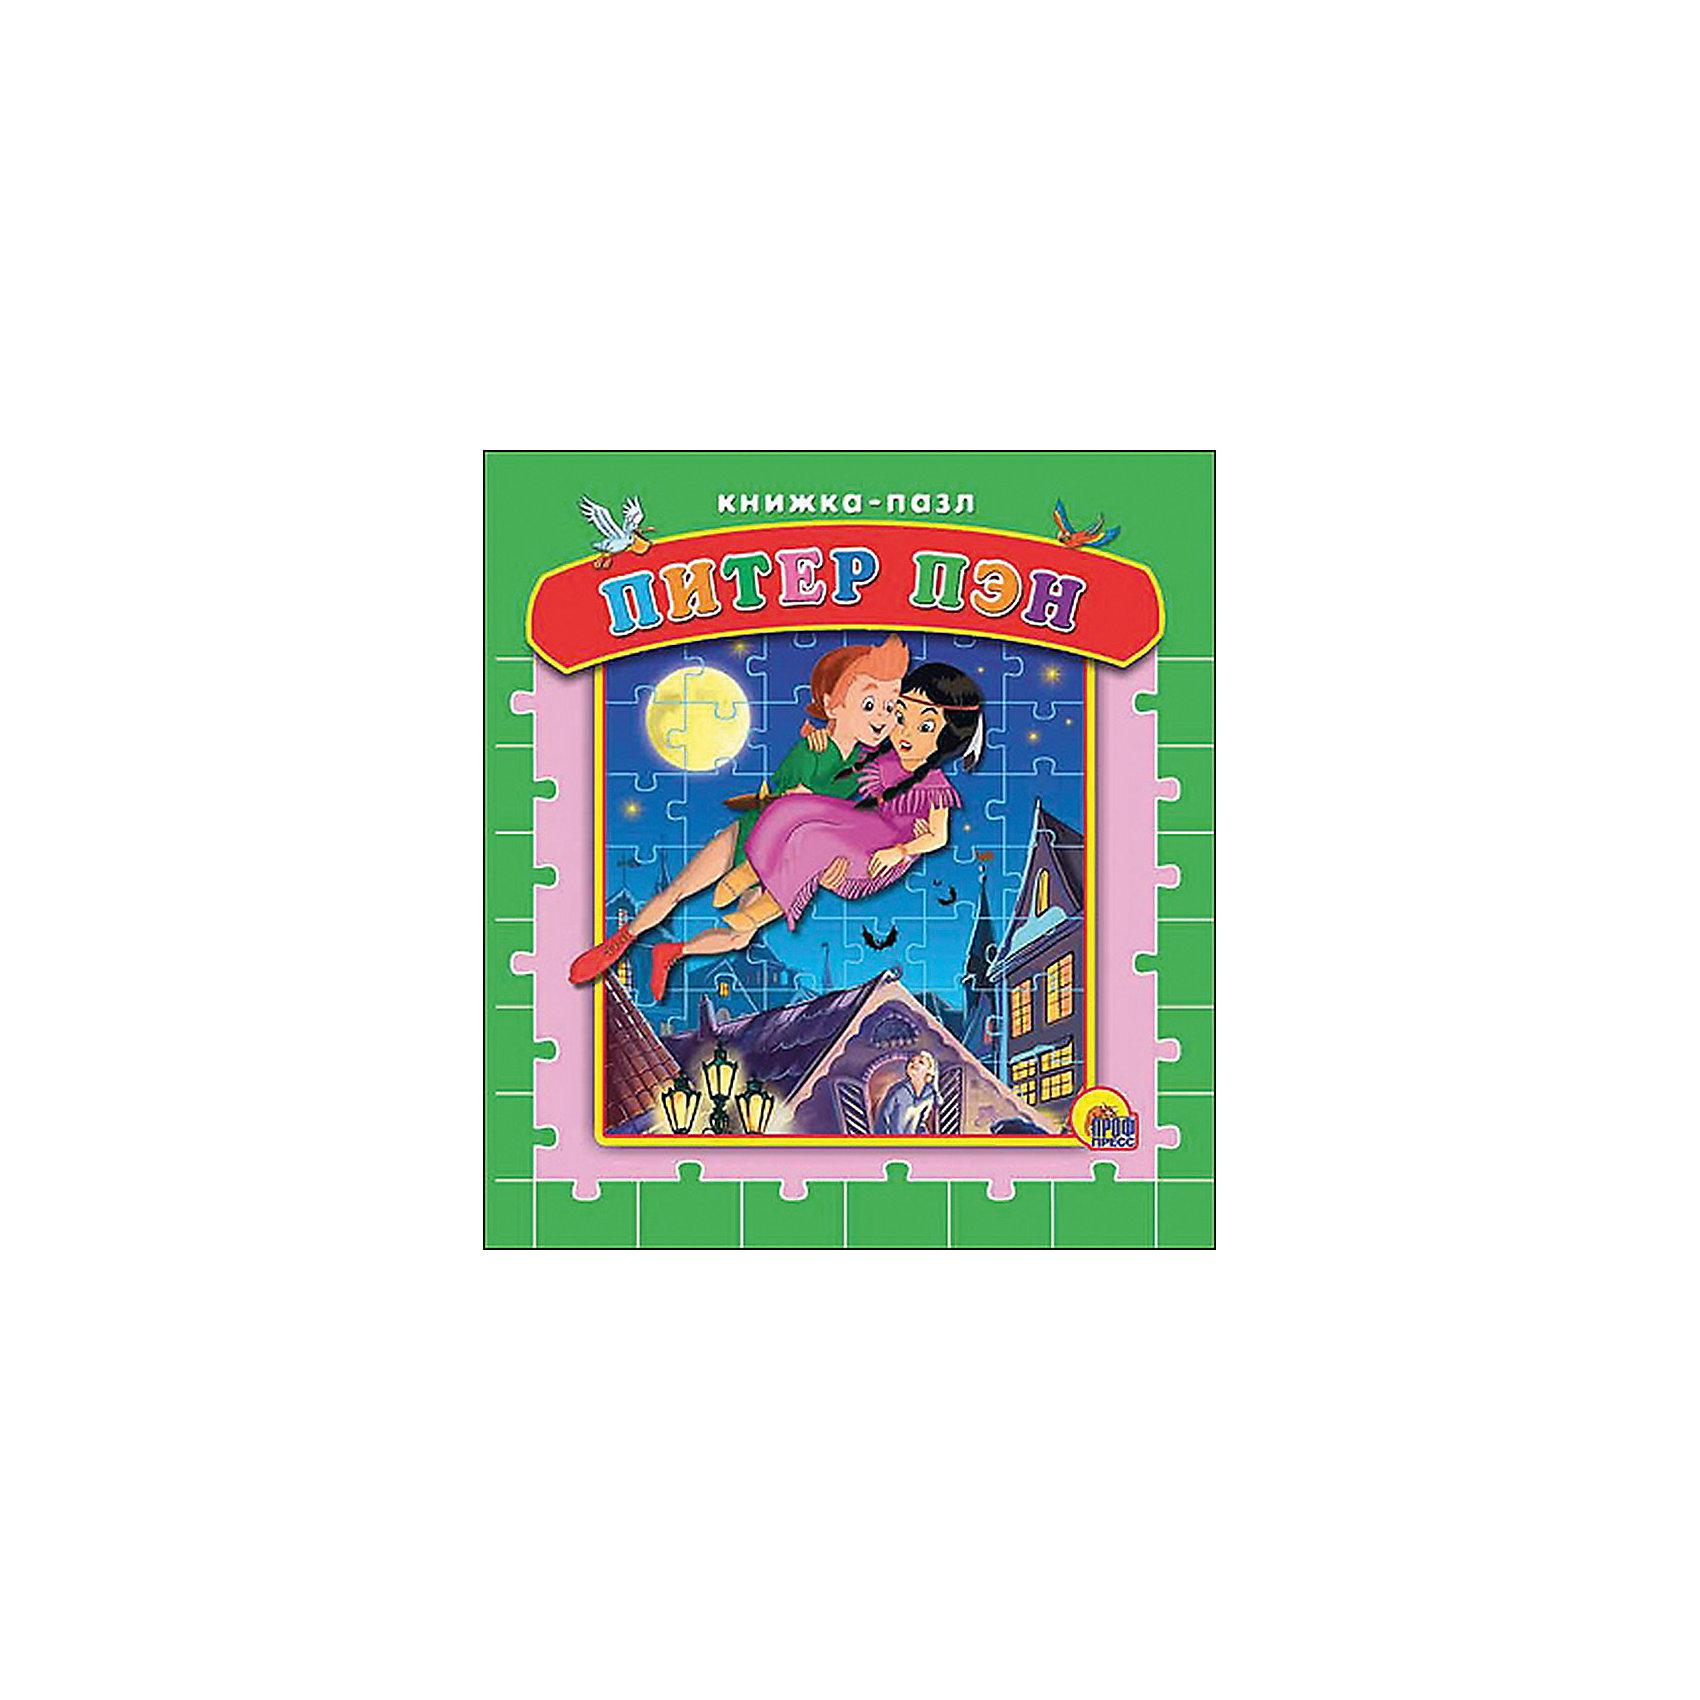 Проф-Пресс Книжка-пазл Питер Пэн пазлы magic pazle объемный 3d пазл эйфелева башня 78x38x35 см